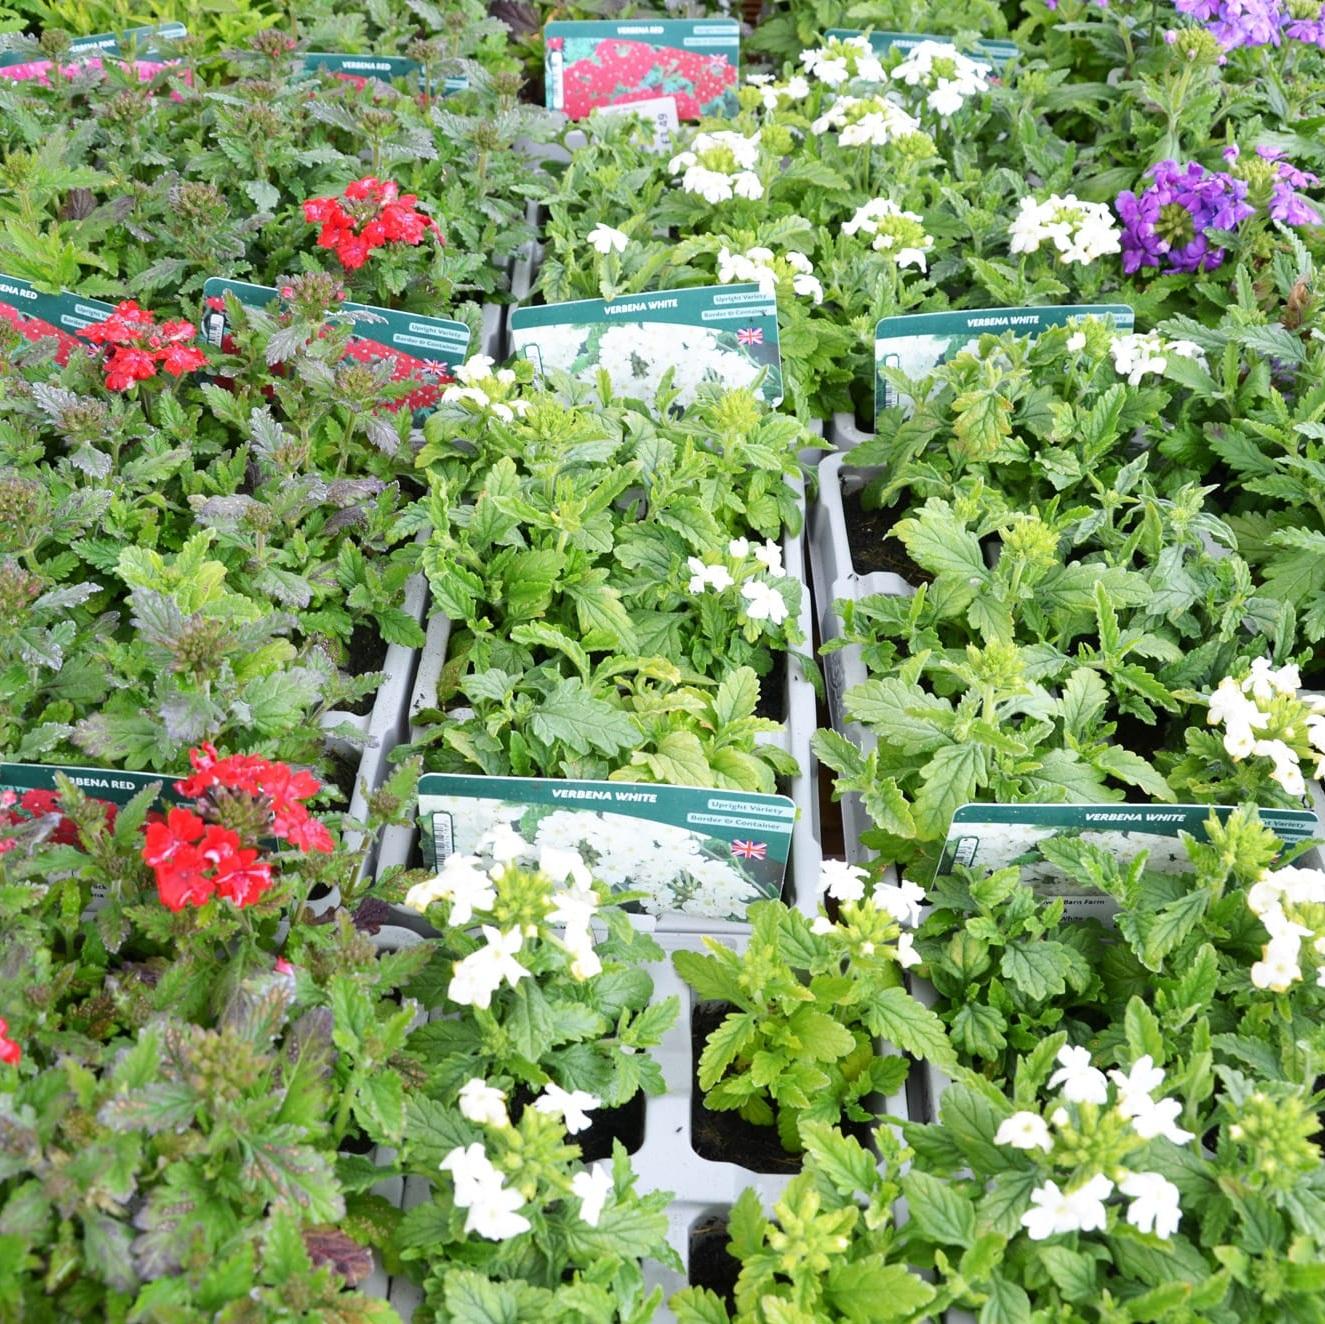 bedding, perennials, shrubs, trees -